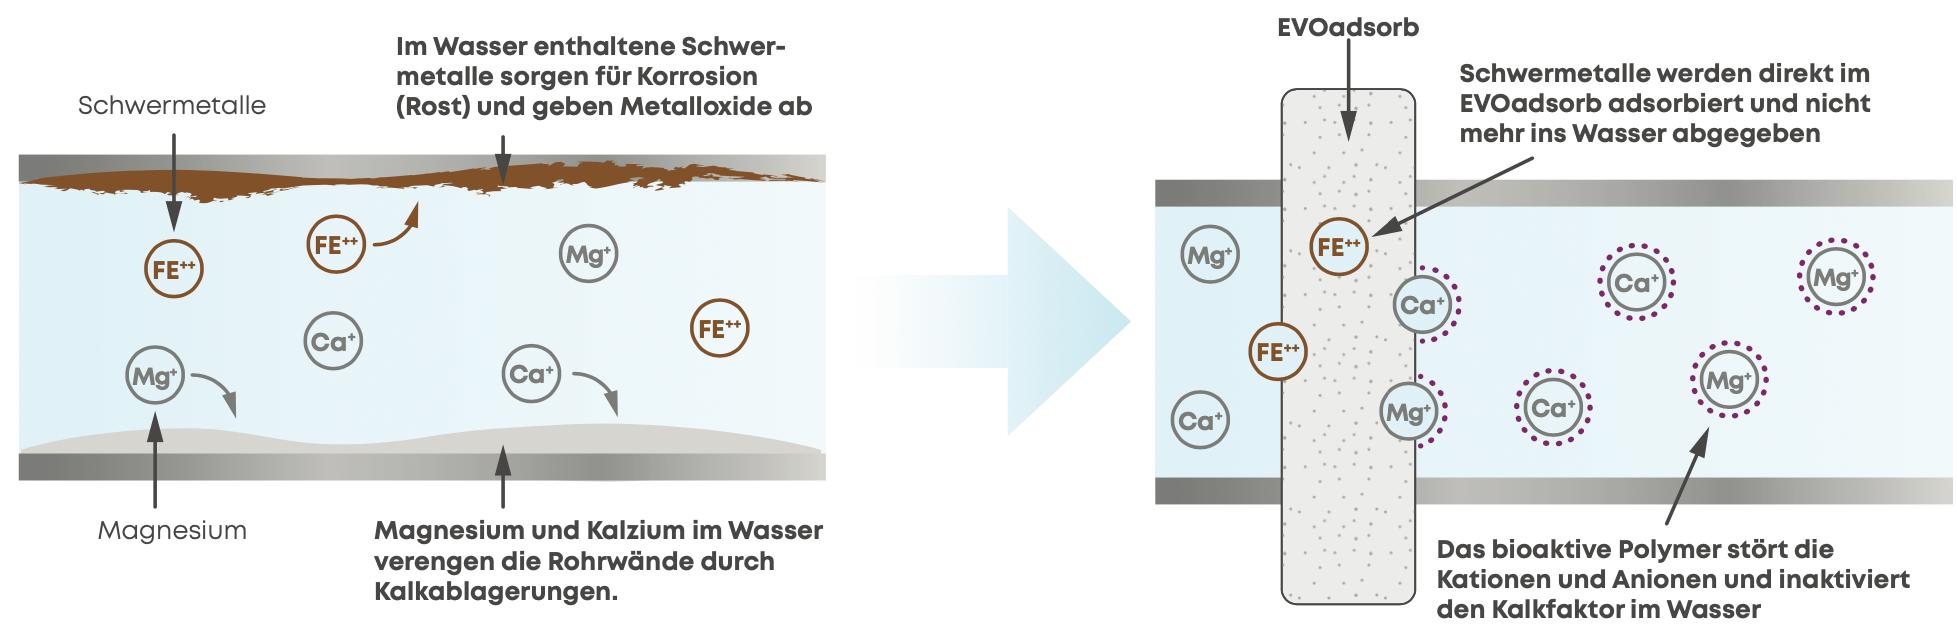 EVOdrop_Darstellung_Kalkschutzprinzip